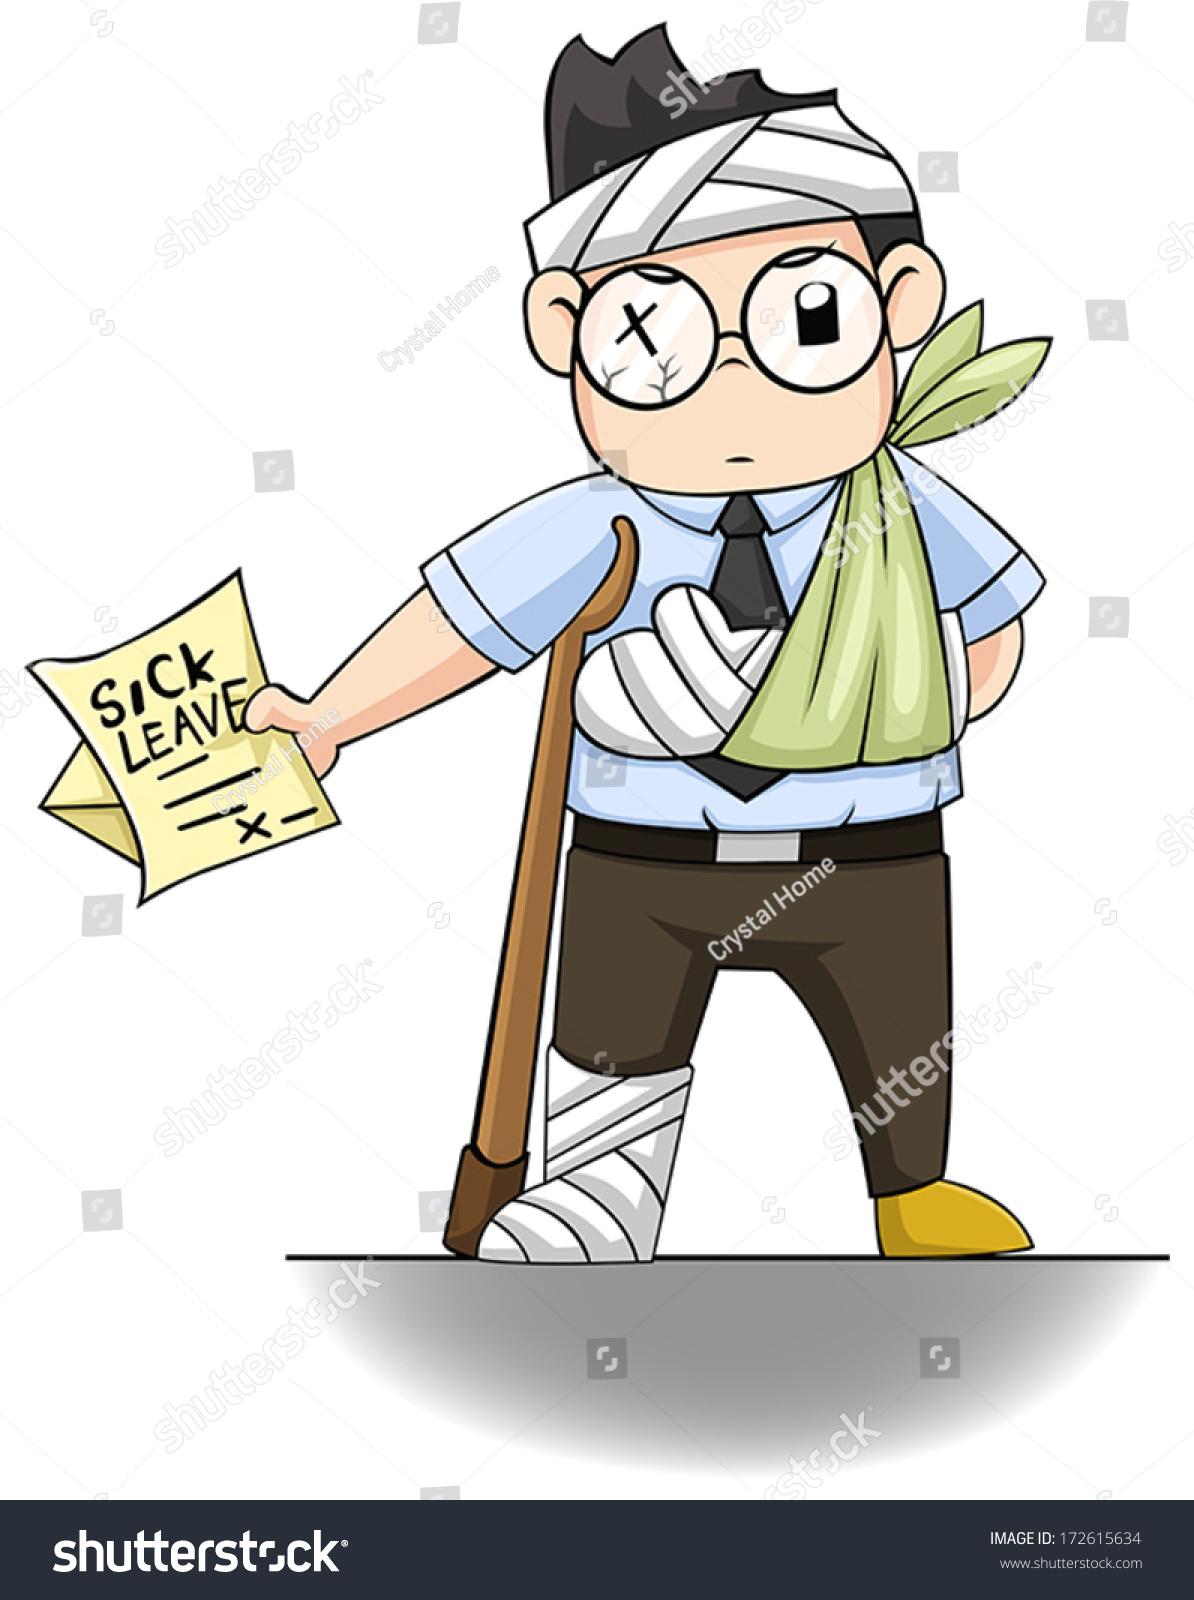 Cartoon Network Character Designer Salary : Character artist cartoon network salary adultcartoon